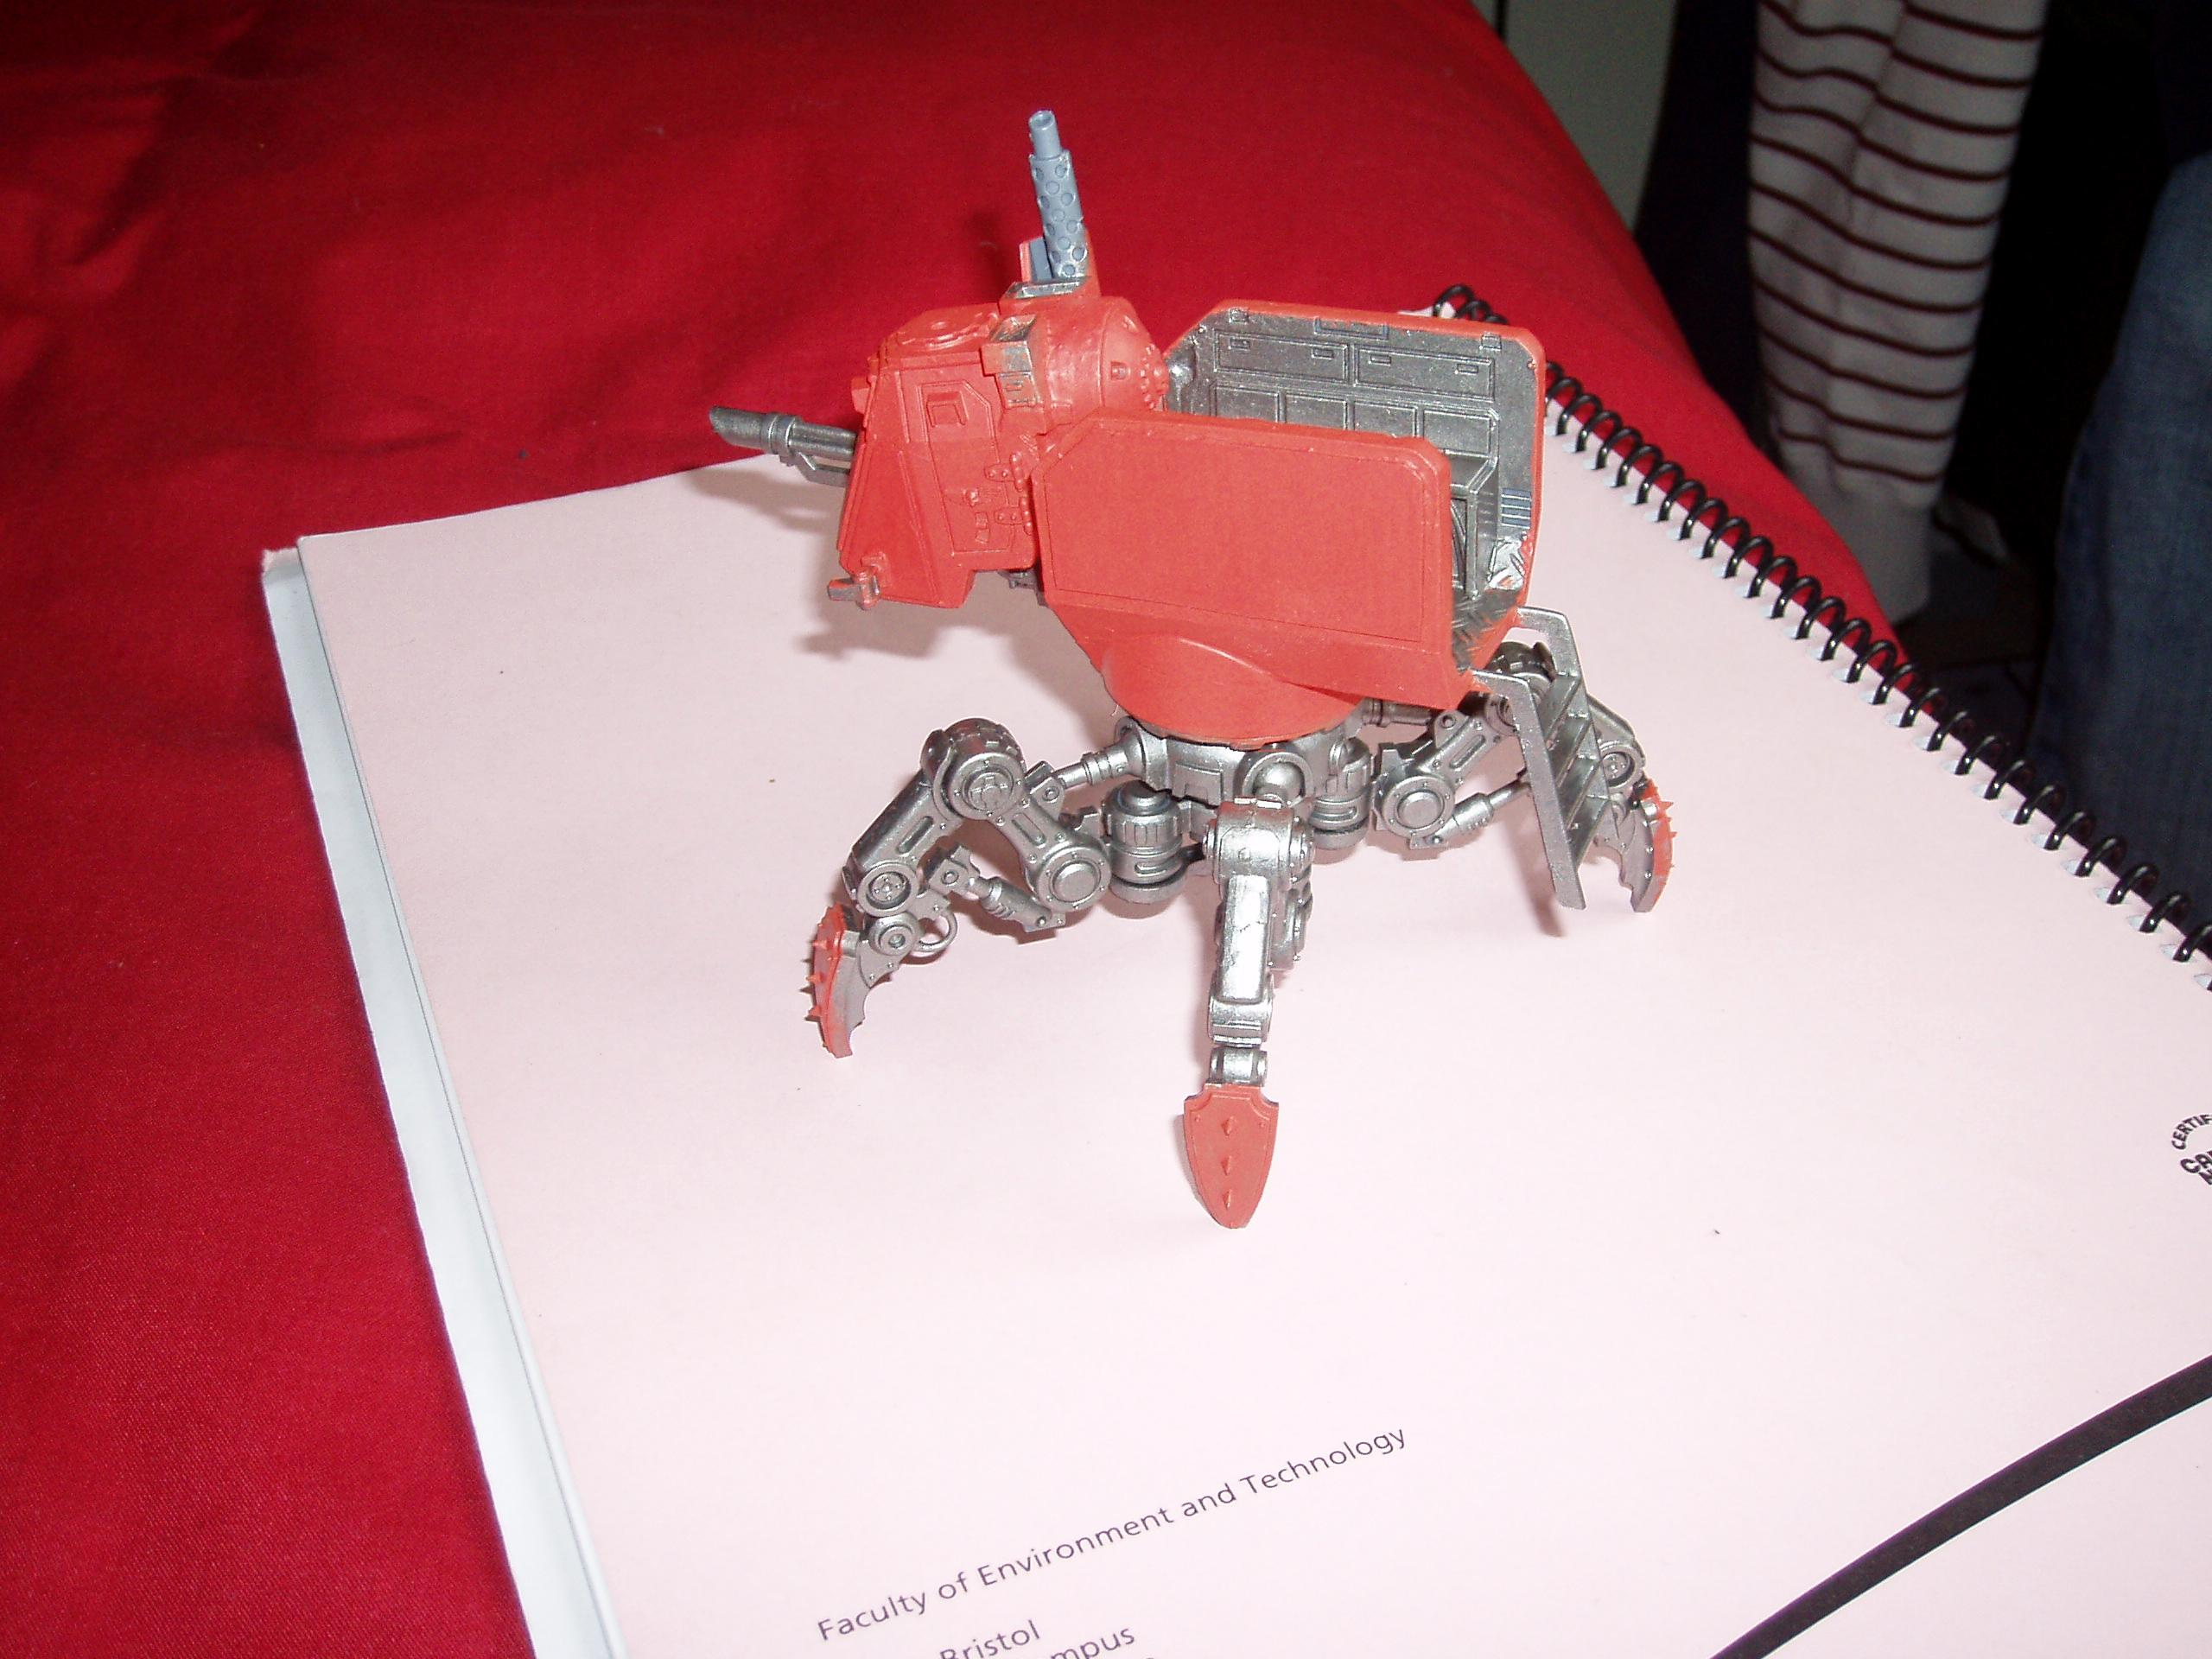 Mars Universal Land Engine, Mechanicum, Mule, Onager, Ordo Reductor, Skitarii